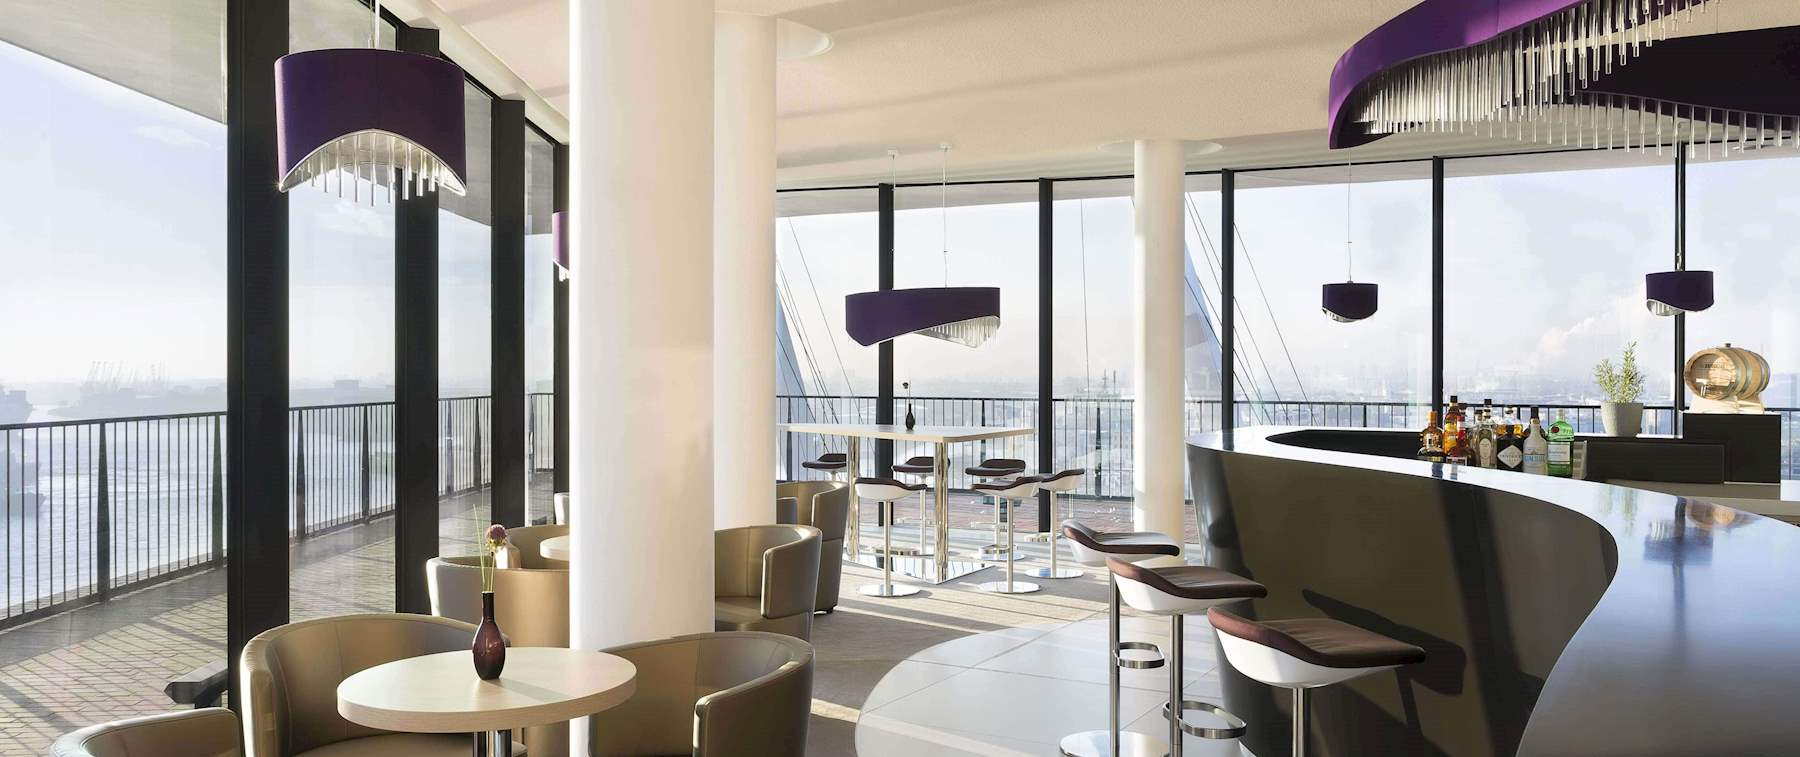 View inside of Bridge Bar